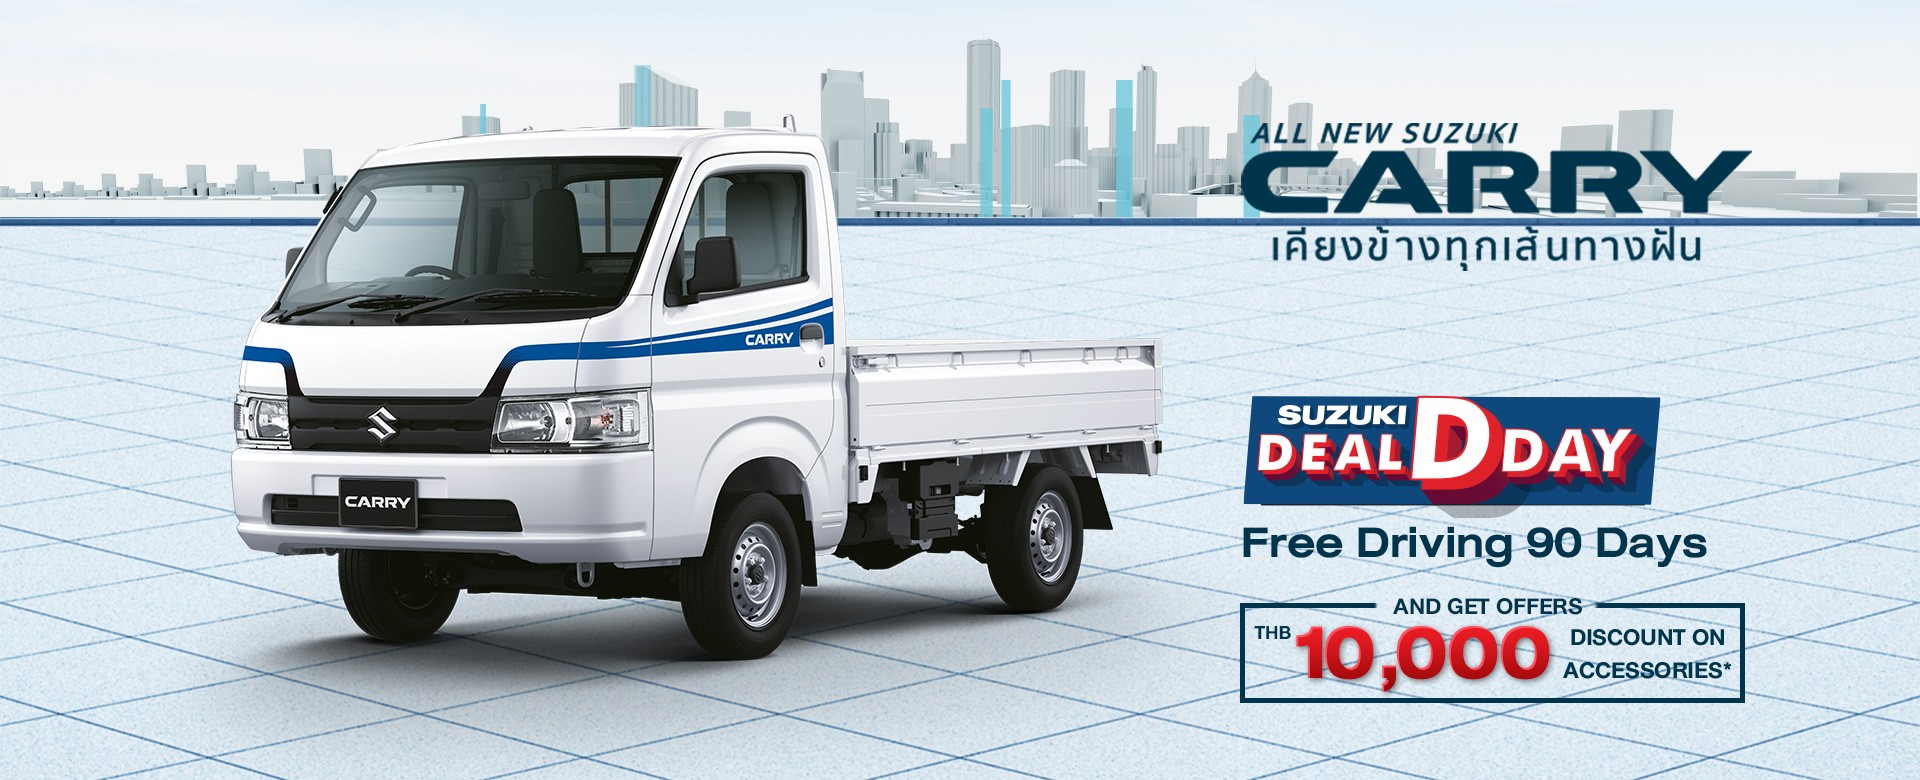 Suzuki CARRY Promotion